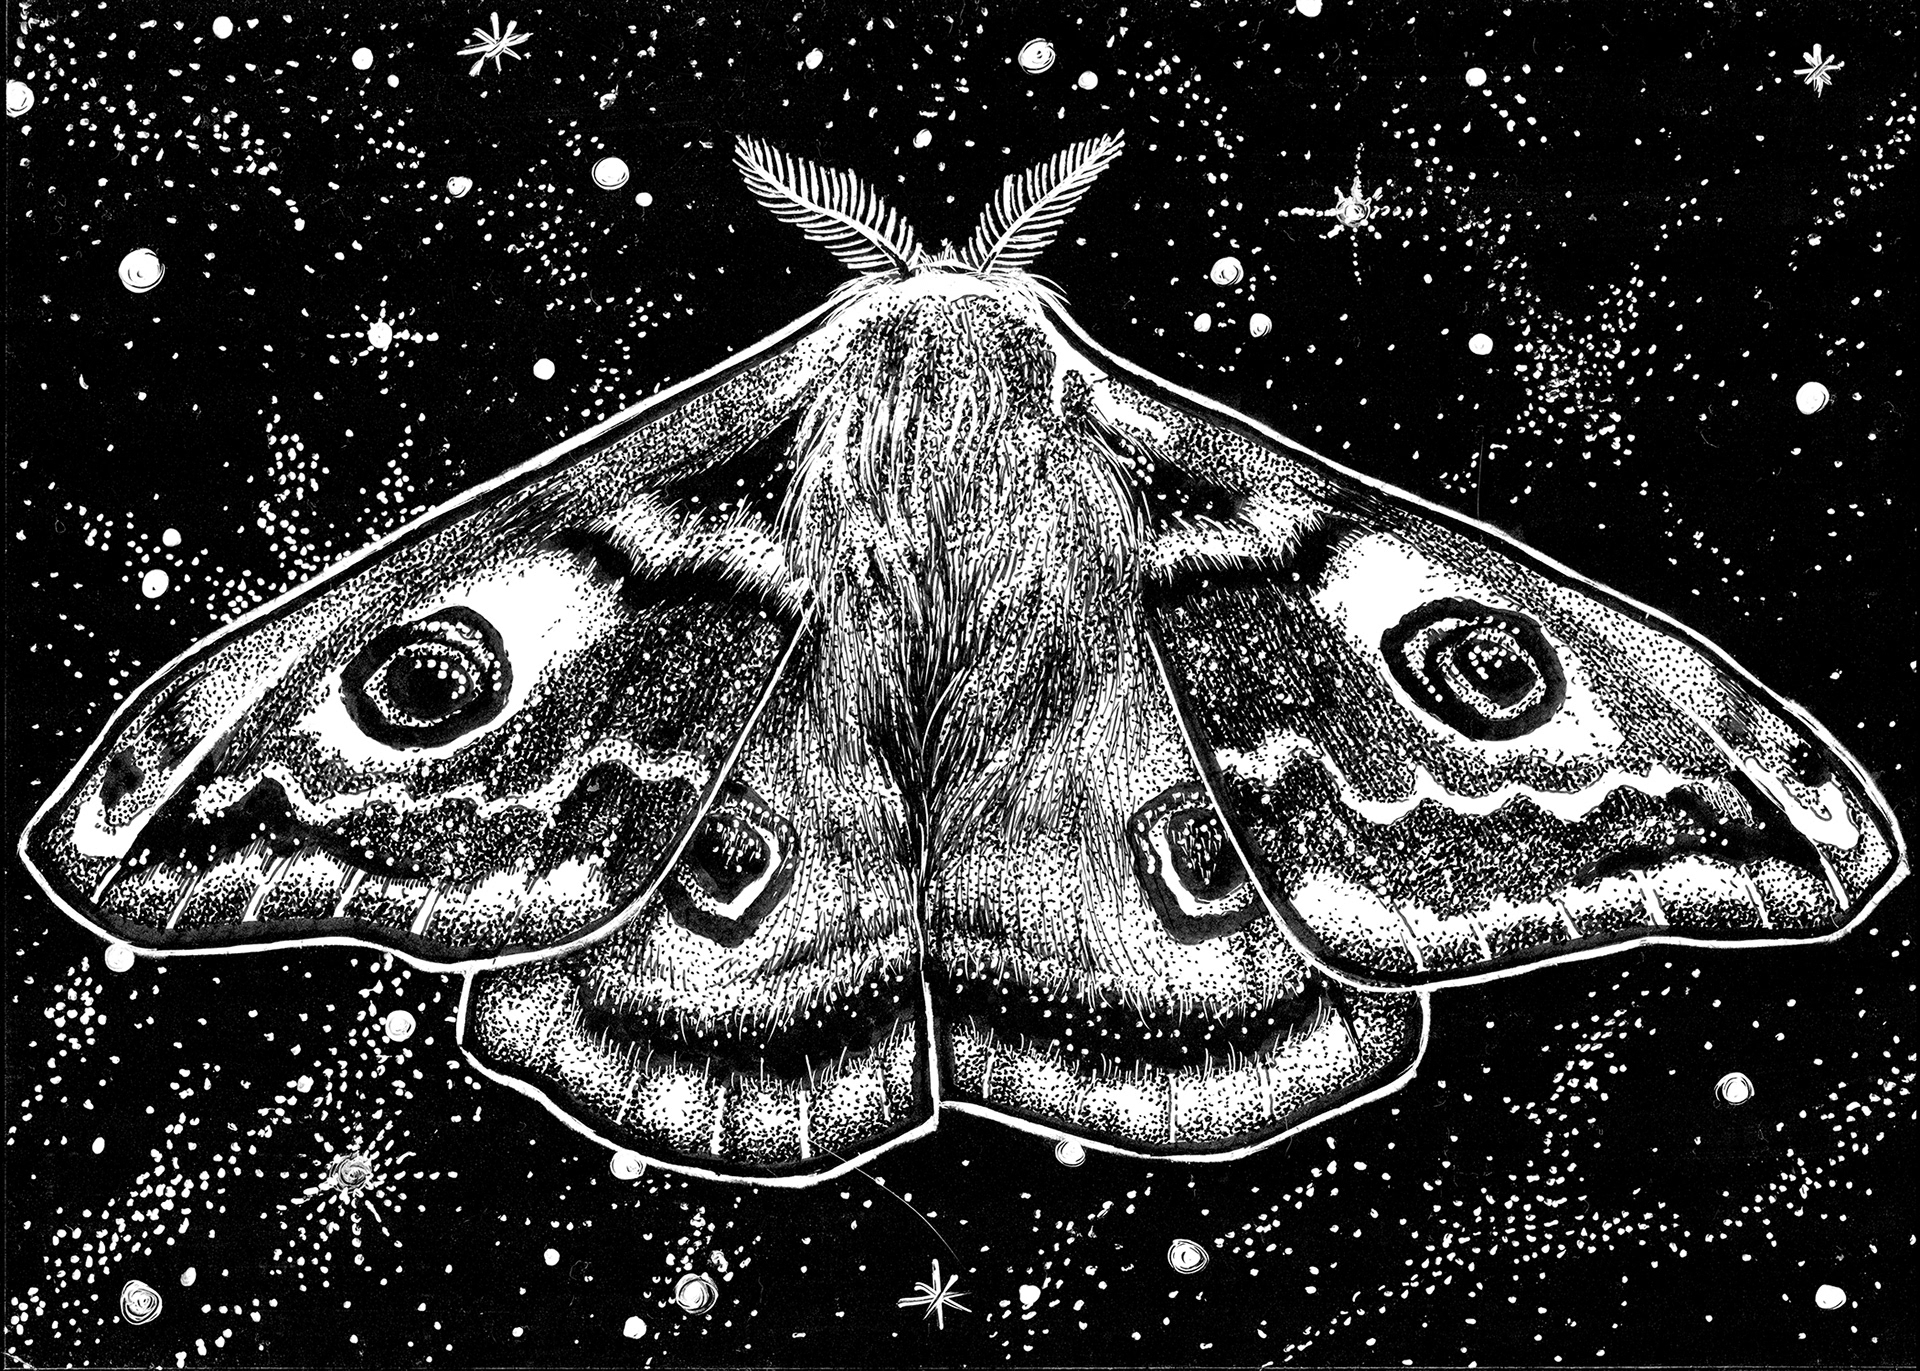 Moth Sketches Monochrome 1920x1371